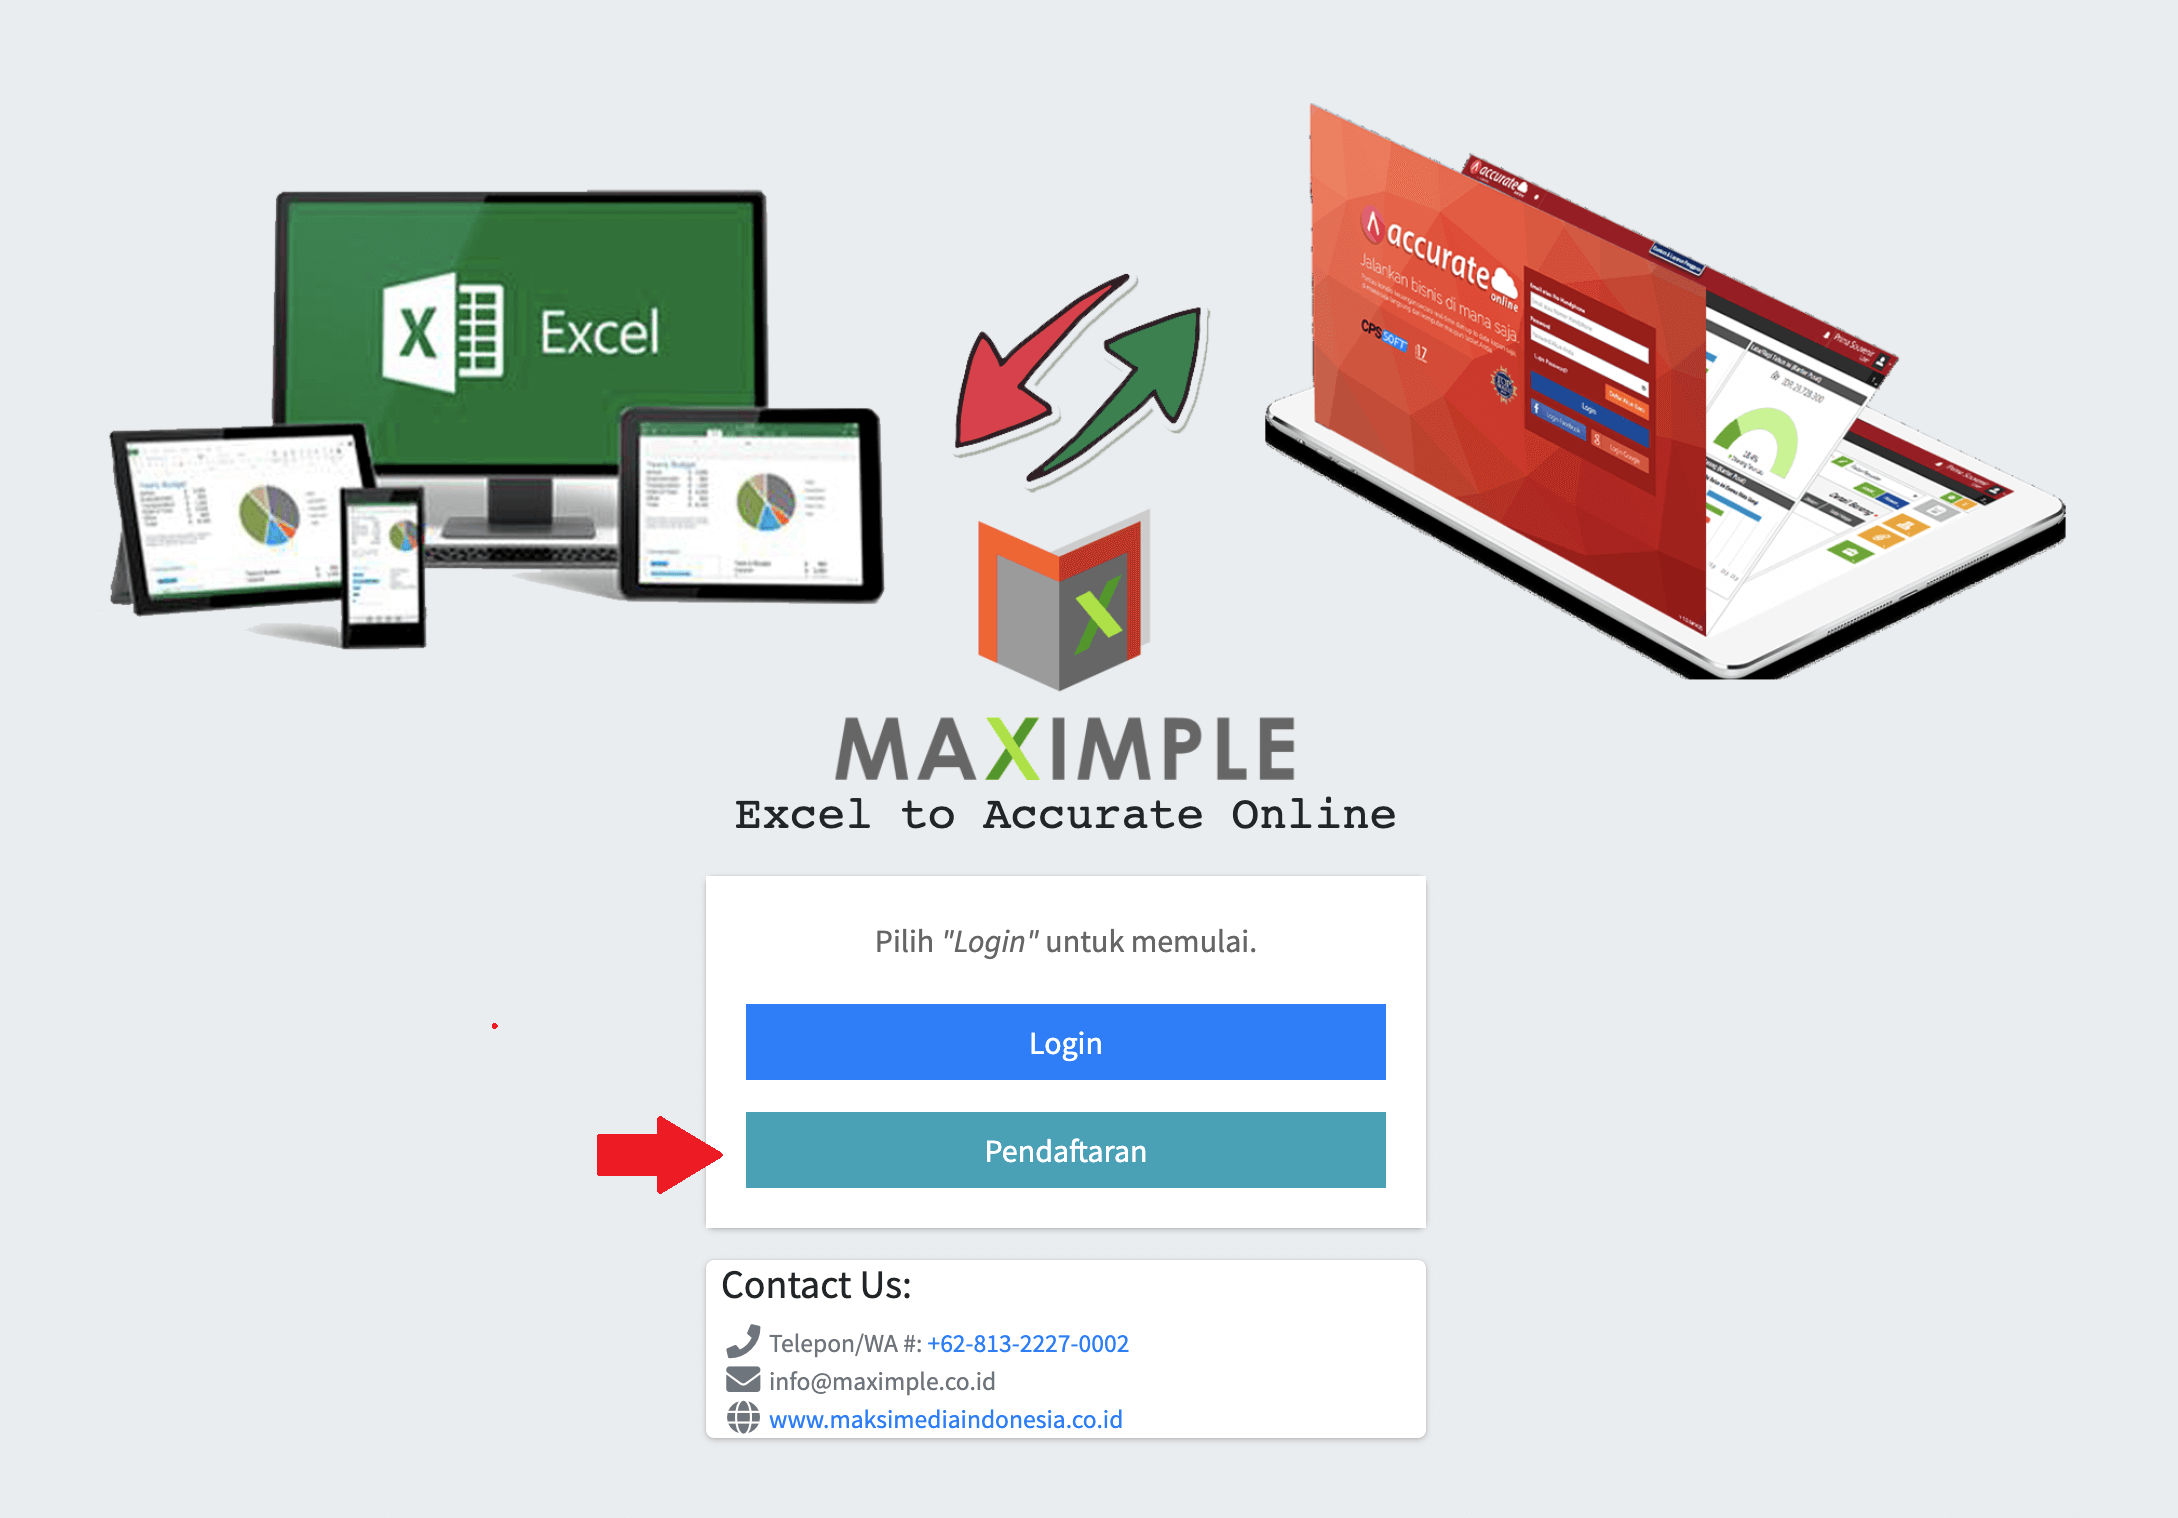 maximple dan Accurate online 1